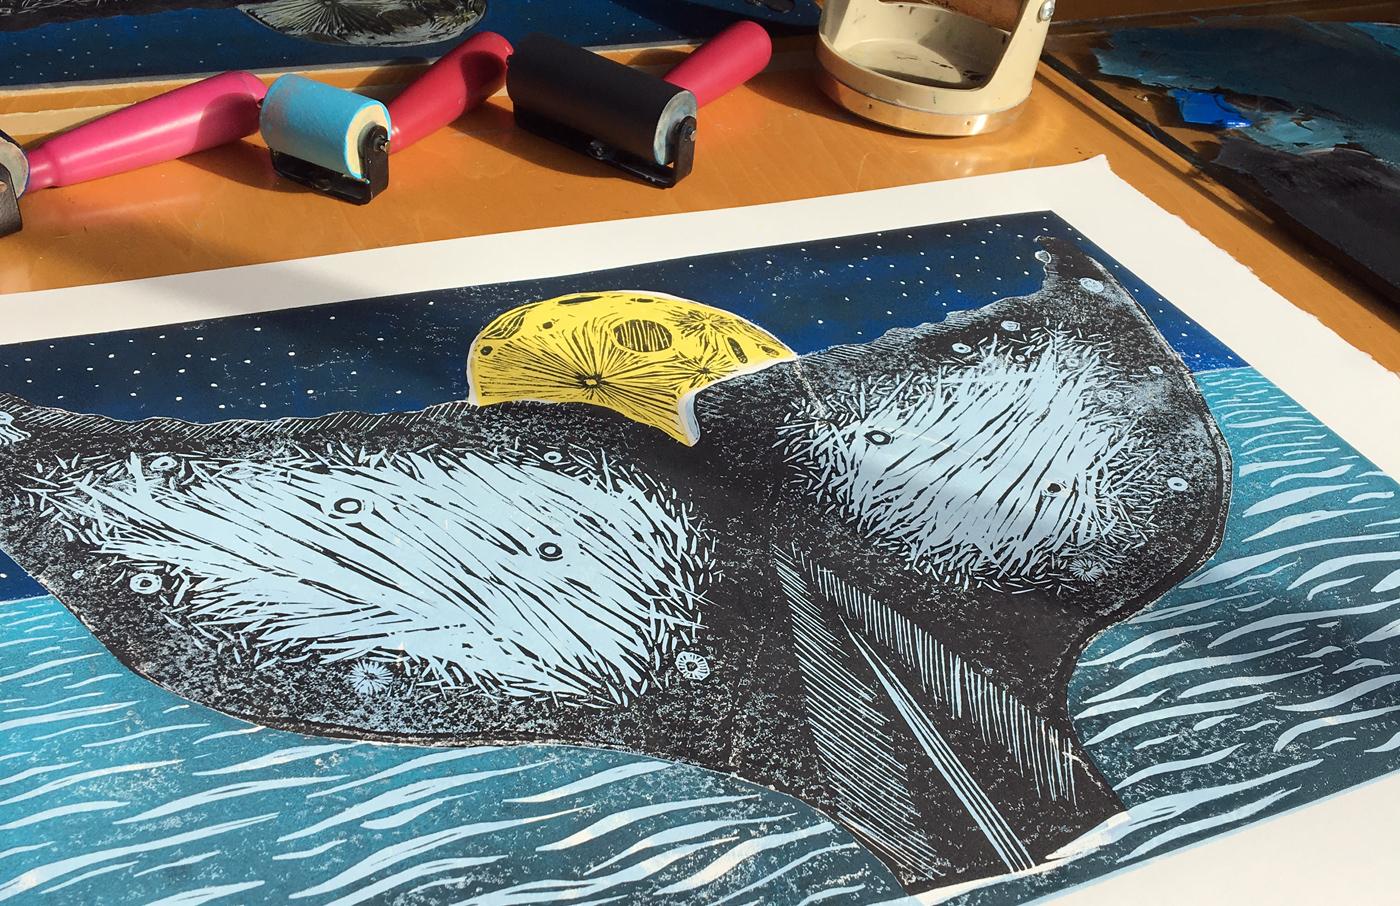 moon whale tail linocut block print artistic process